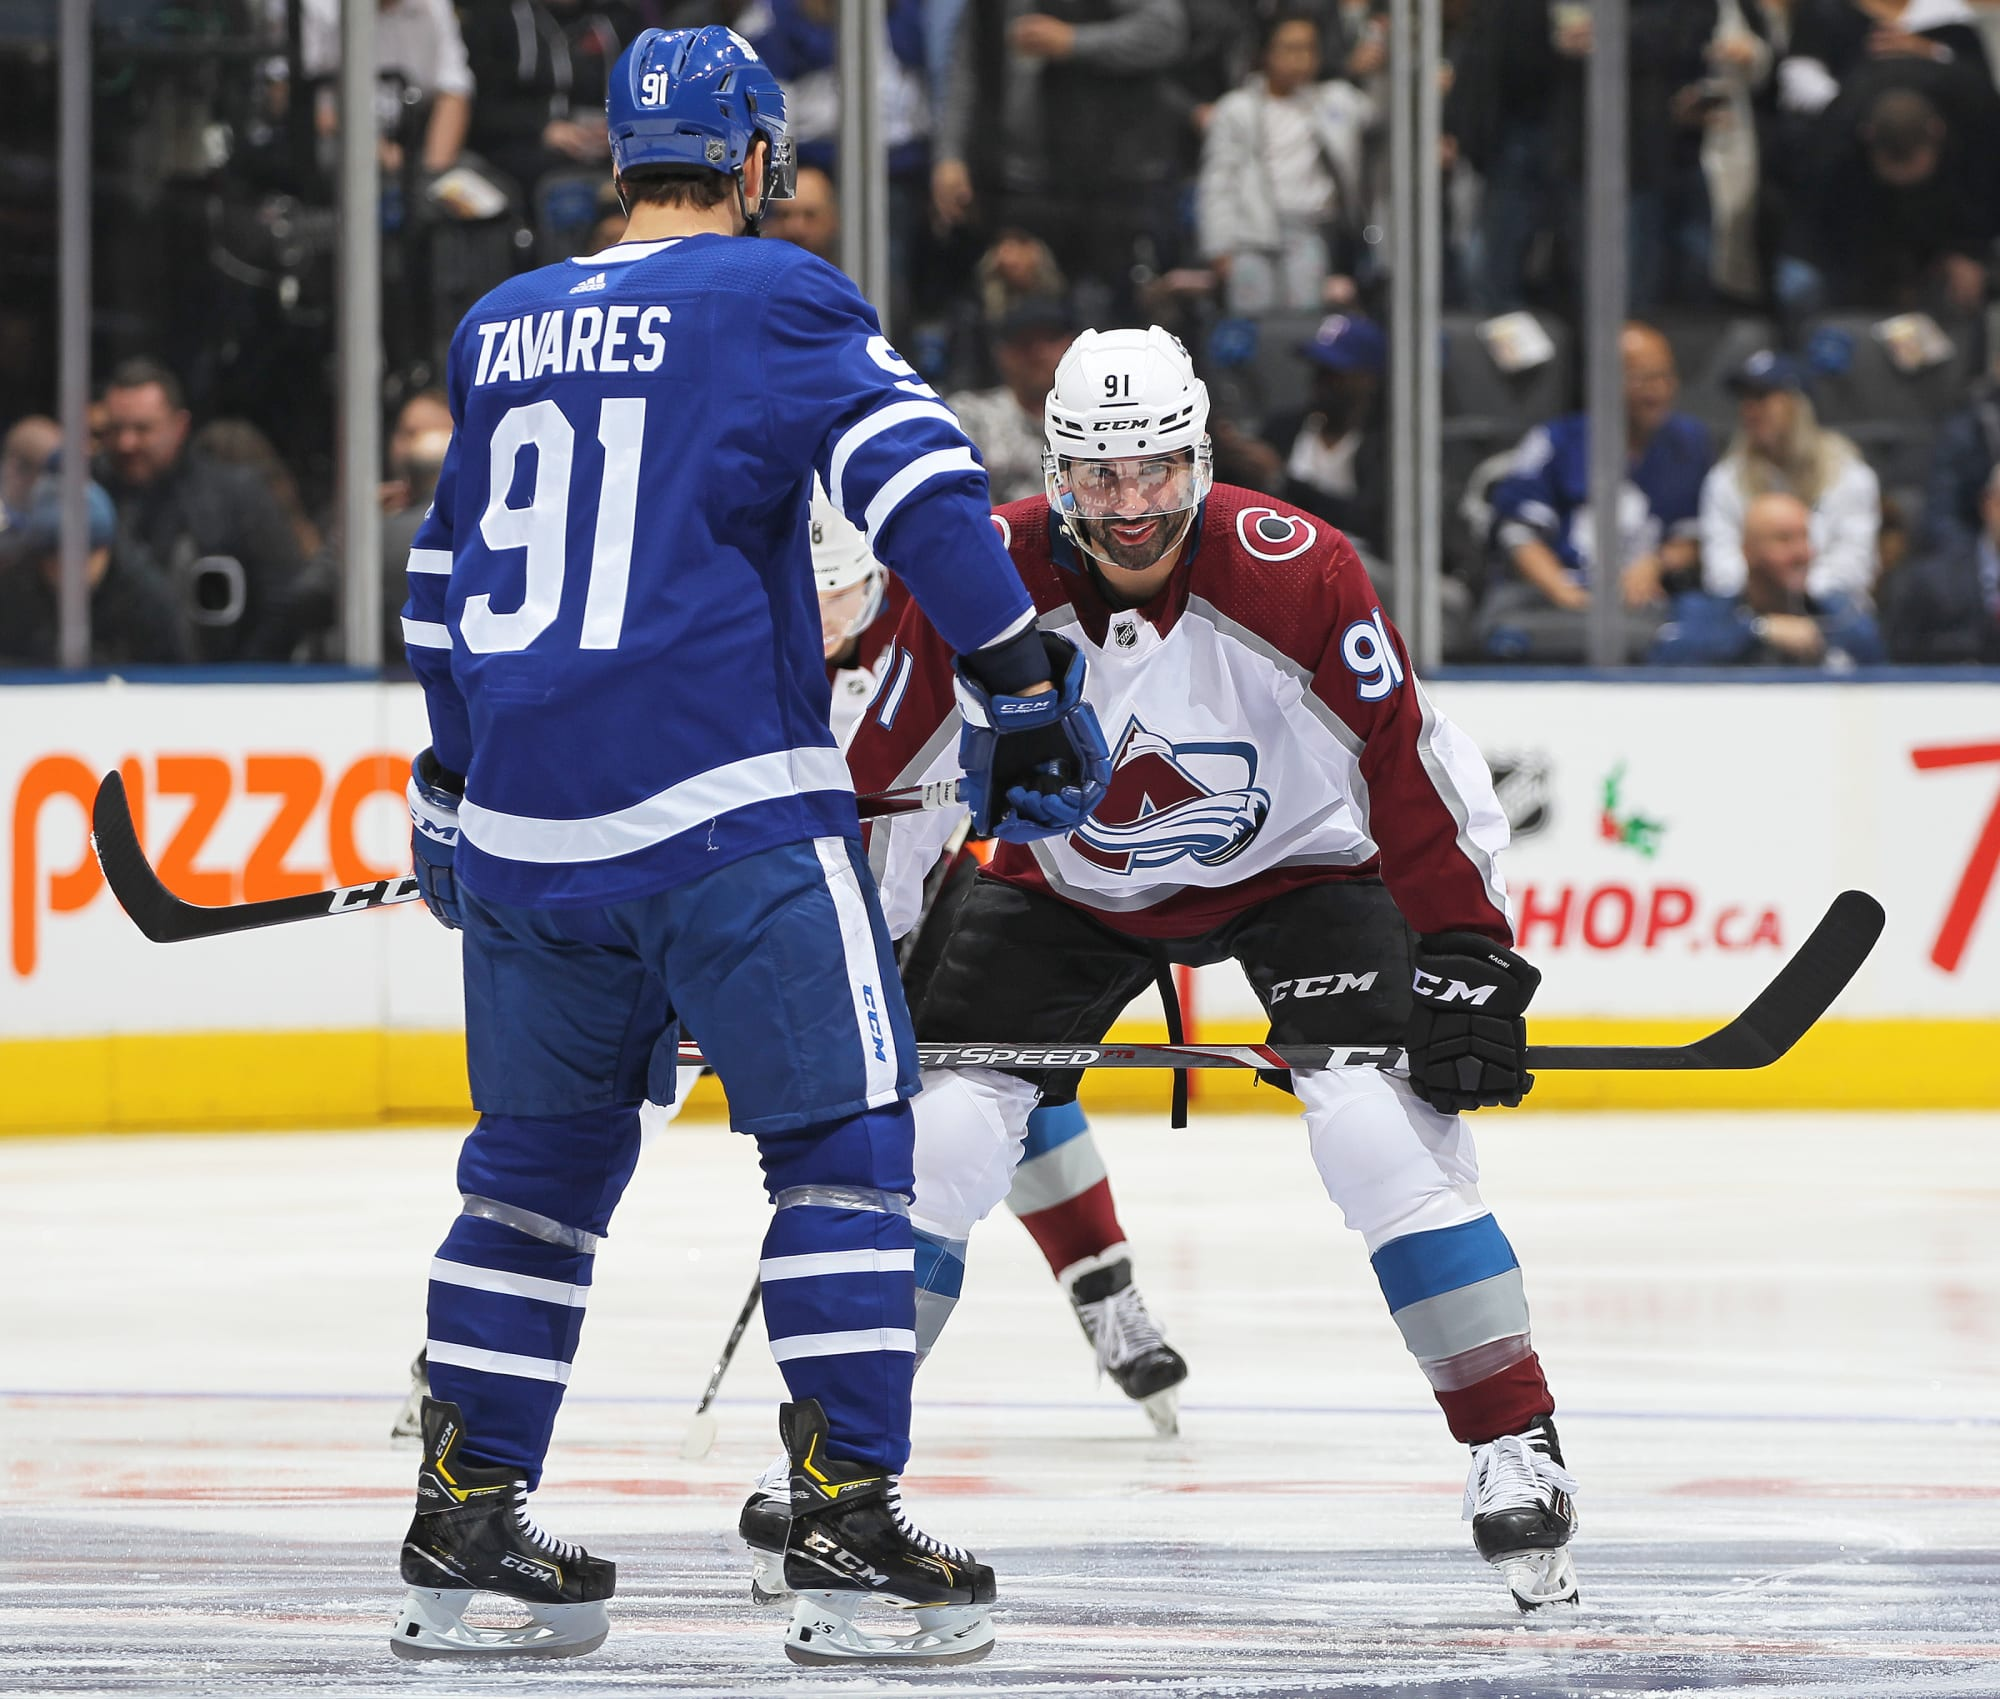 Toronto Maple Leafs Win Nazem Kadri Trade in the End